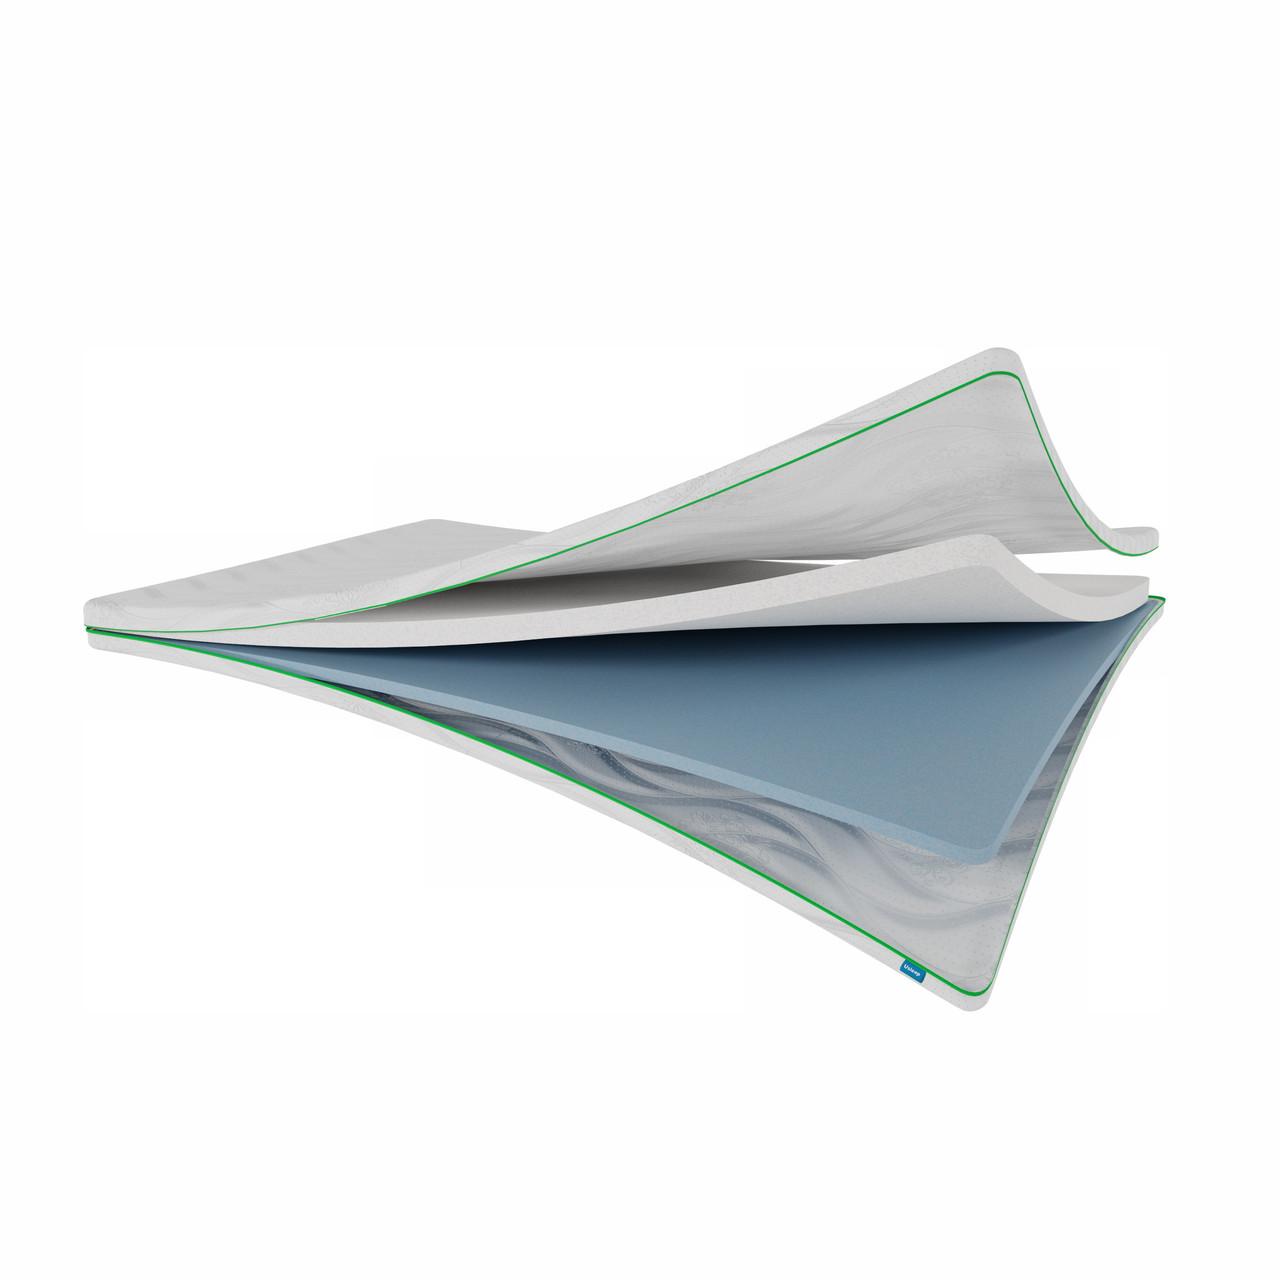 Тонкий матрац топпер-футон SleepRoll Green Usleep 160х200